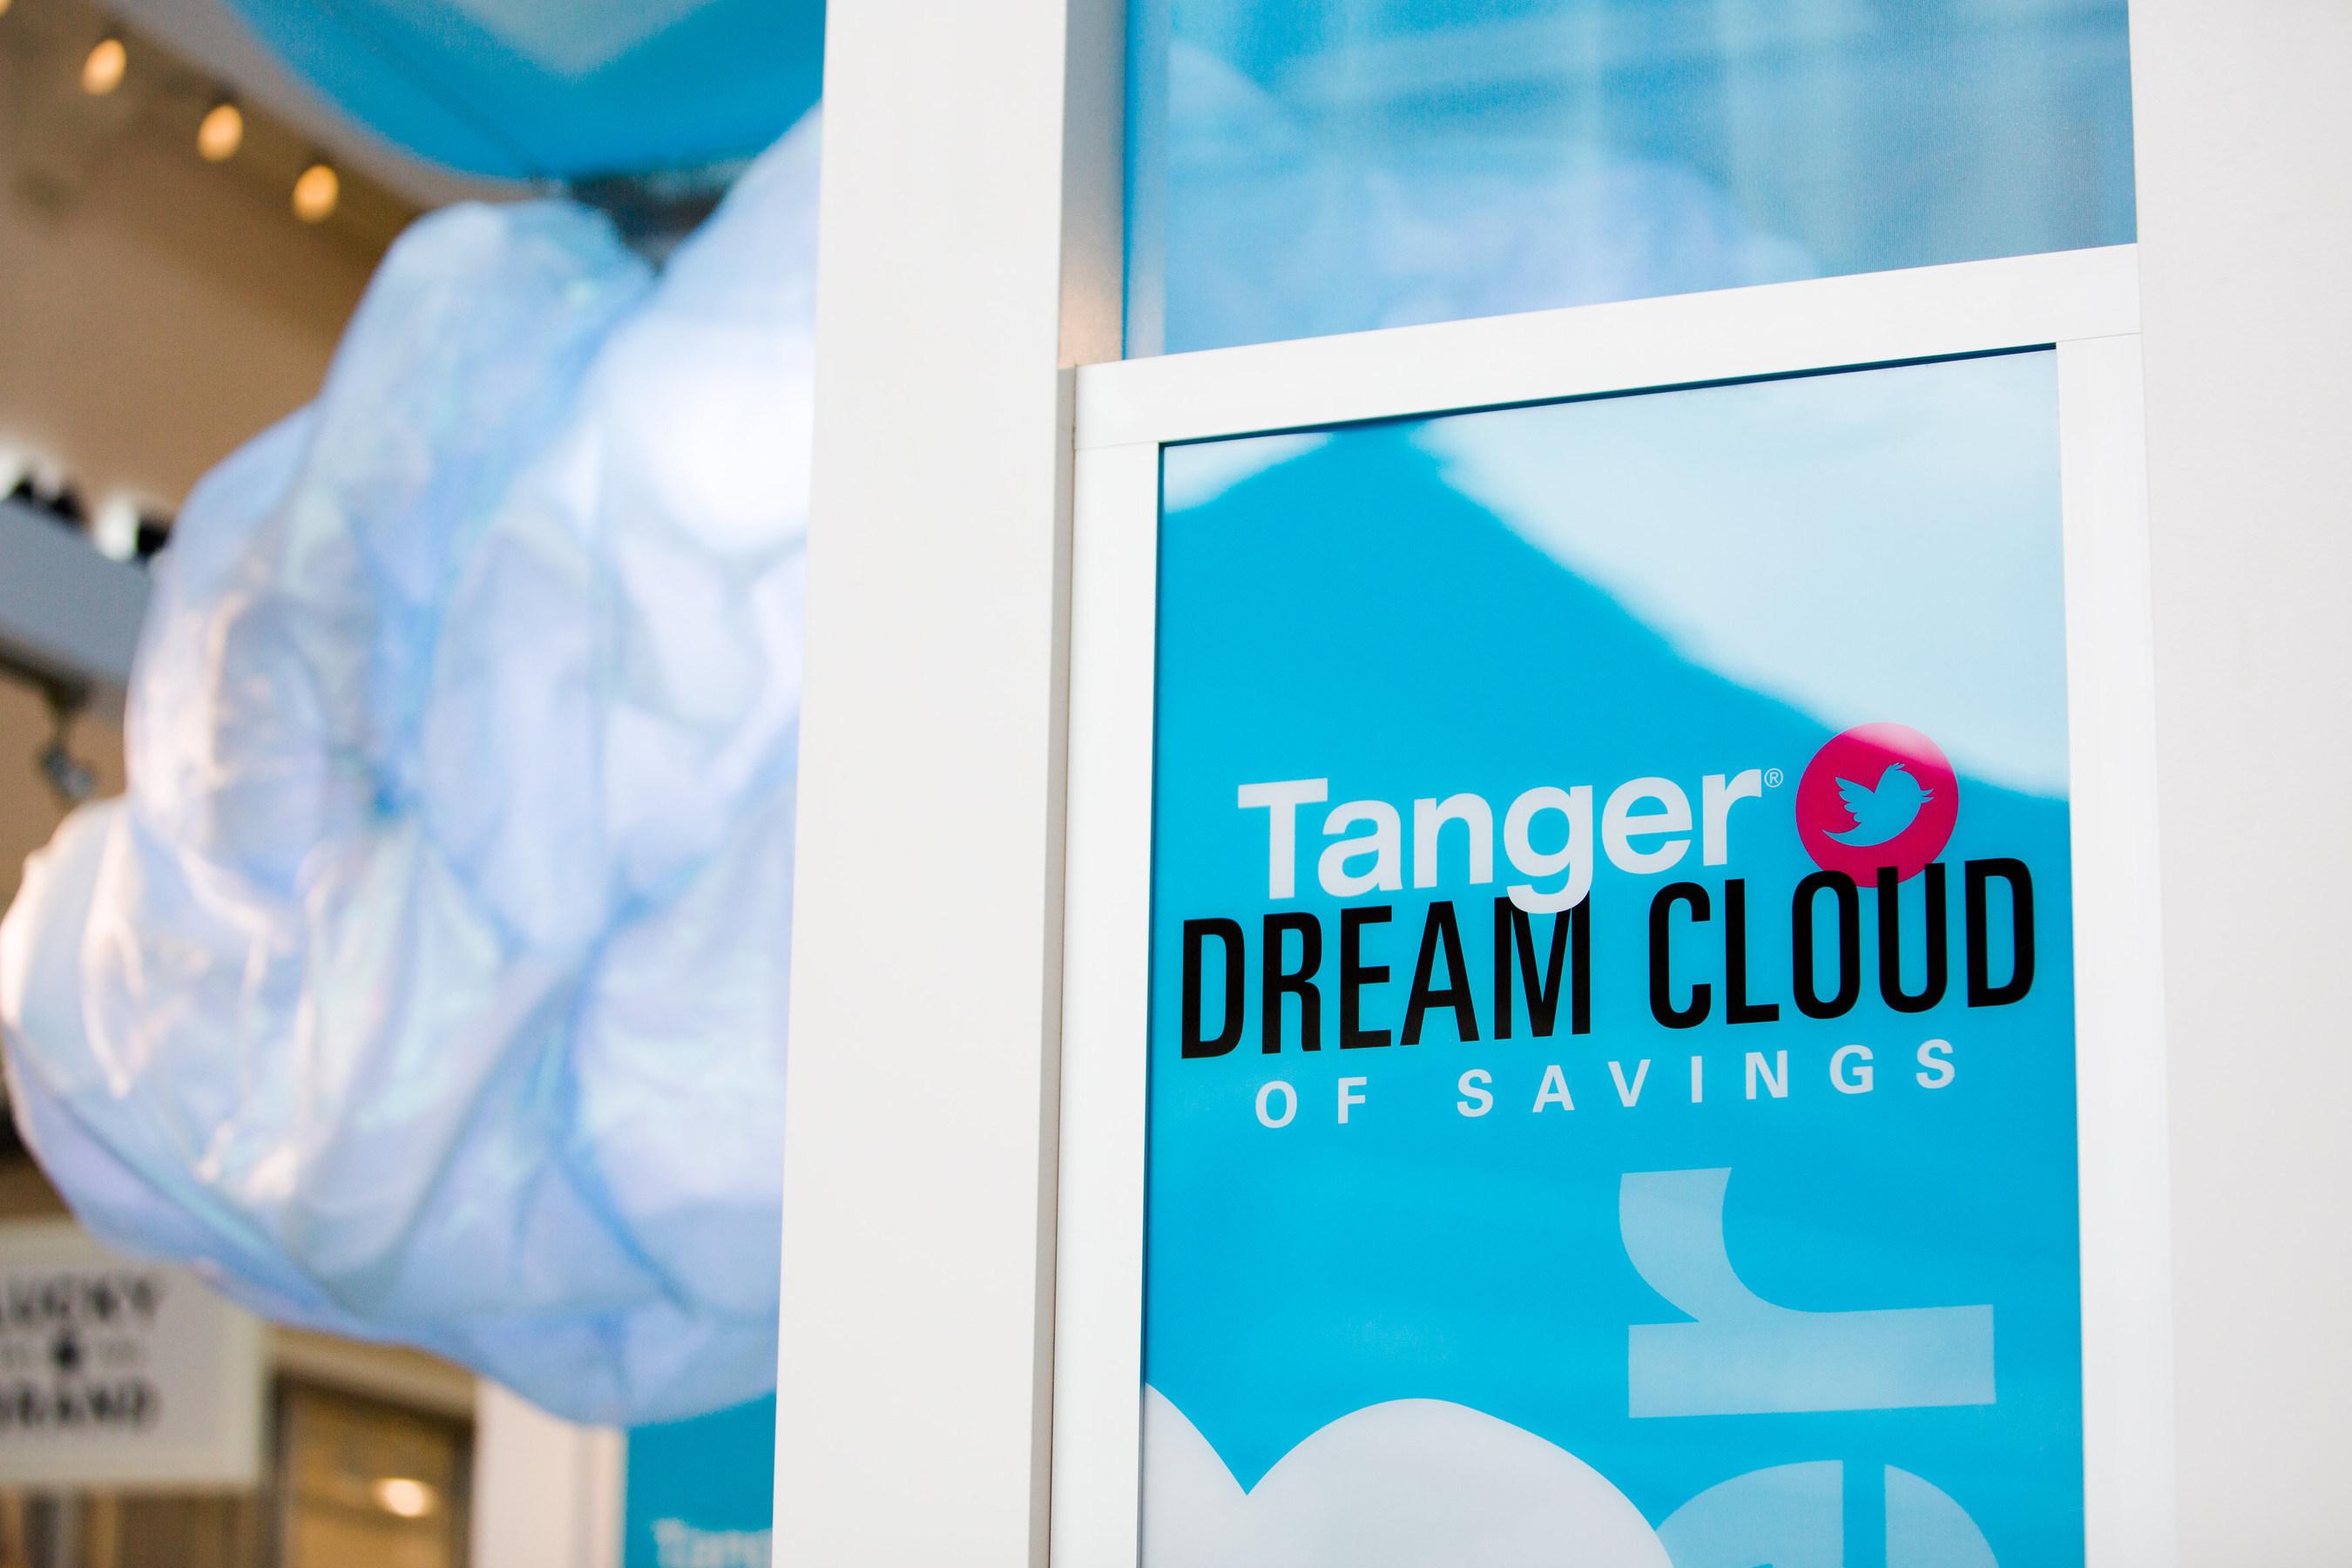 Tanger Dream Cloud 2